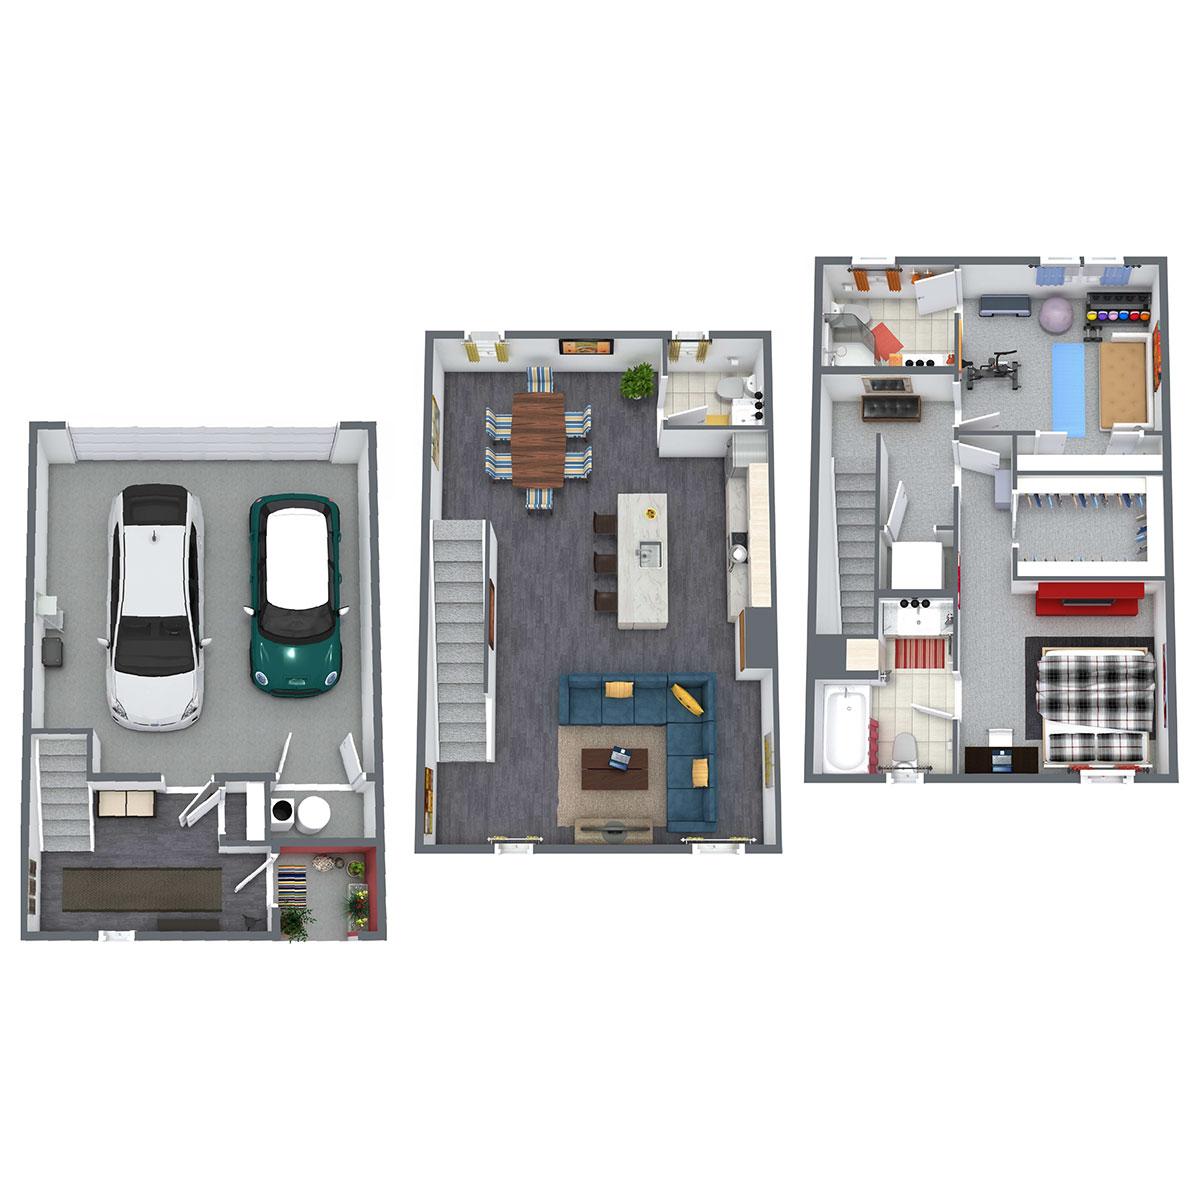 Floorplan - Sycamore - 2 Bedroom image